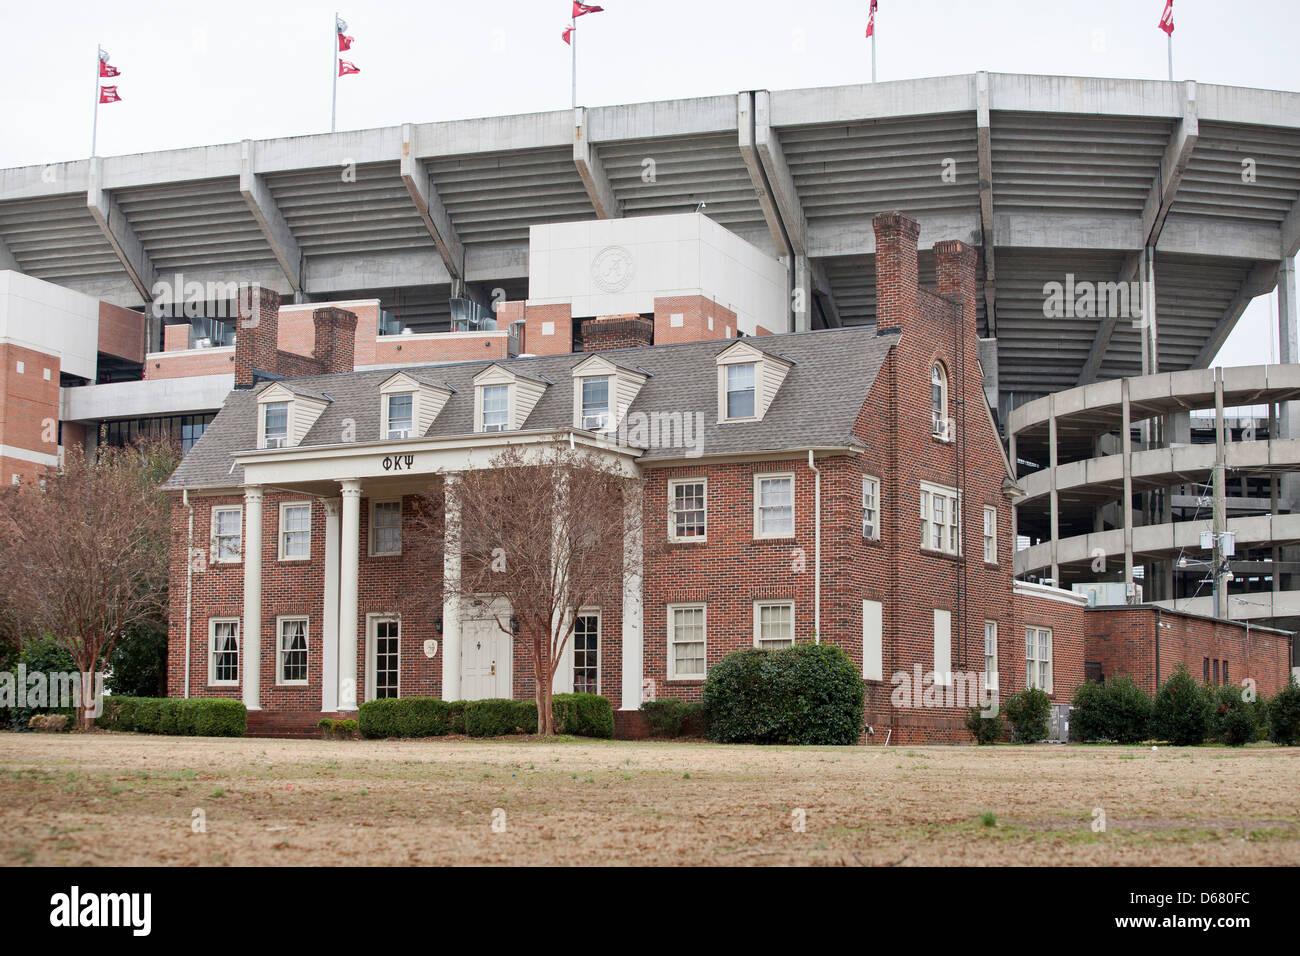 Bryant–Denny Stadium, located in Tuscaloosa, Alabama,USA - Stock Image